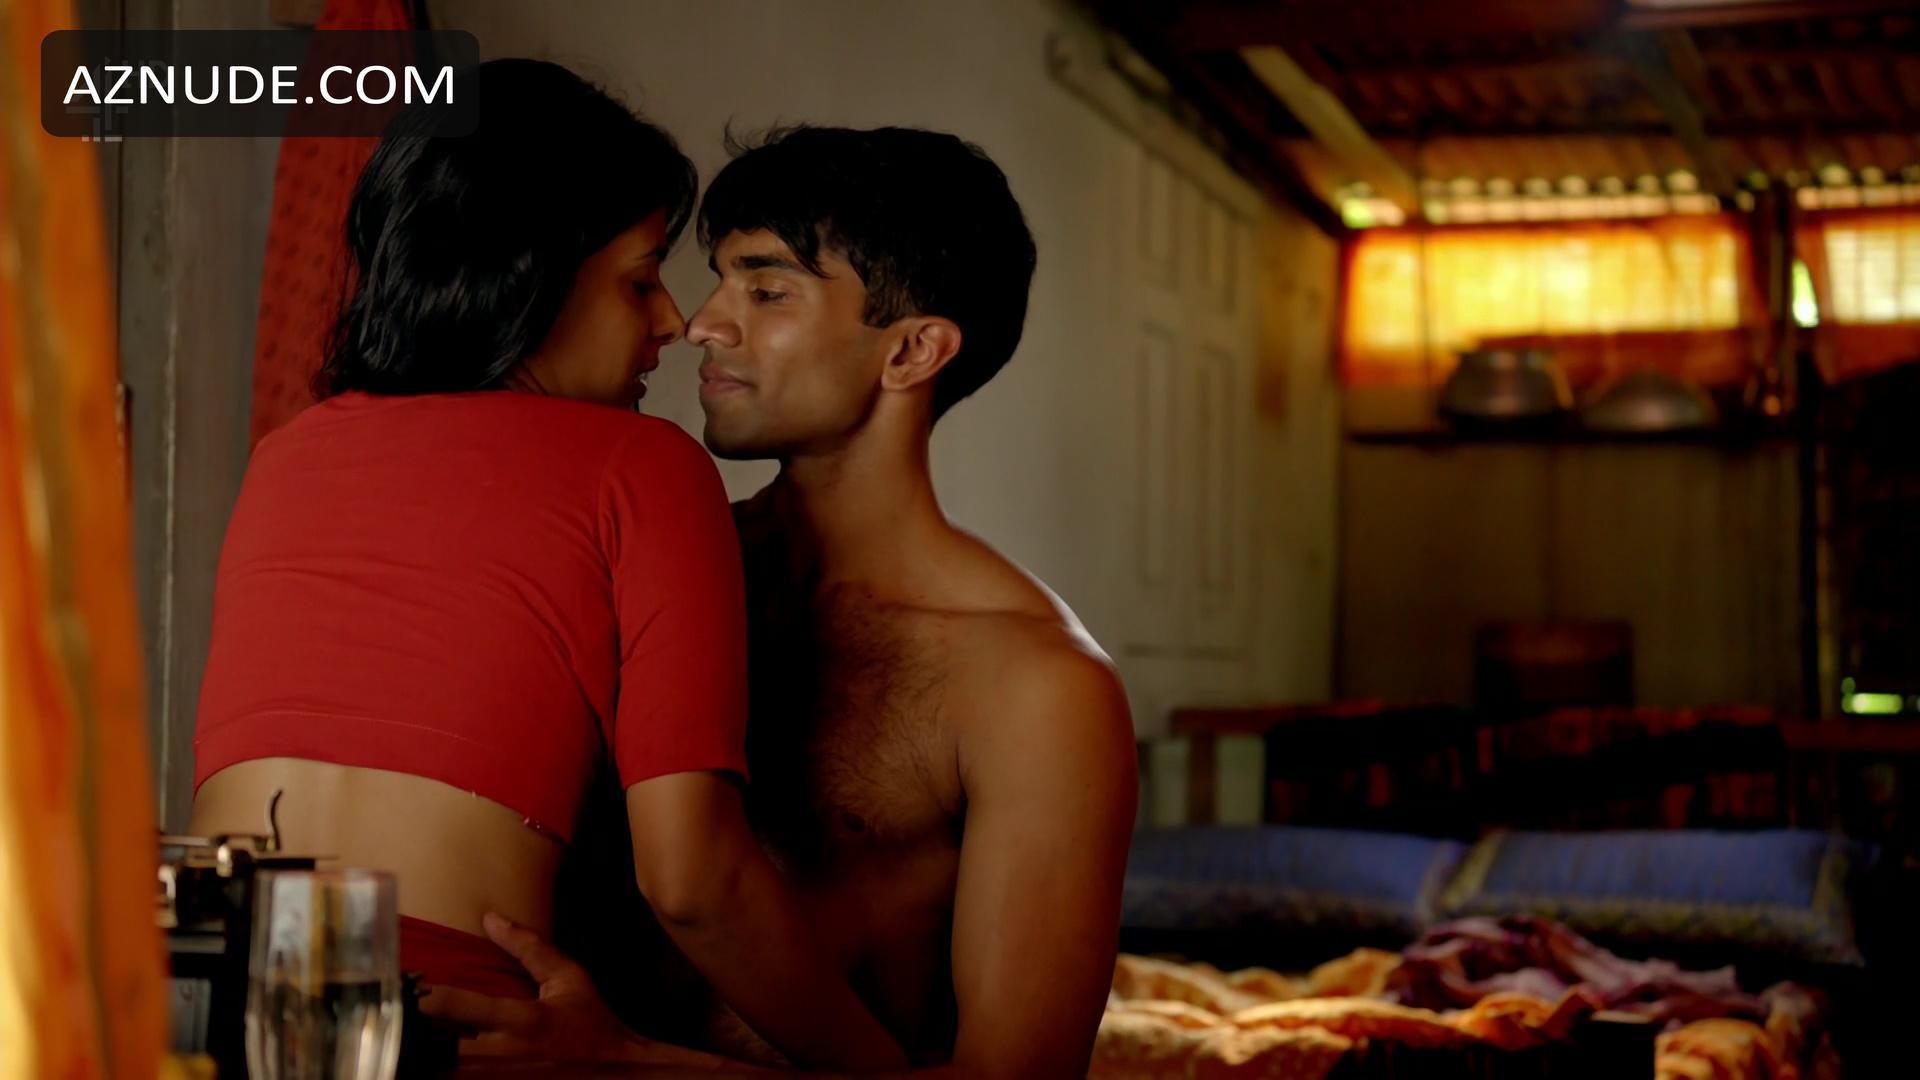 Best Website For Indian Sex Videos